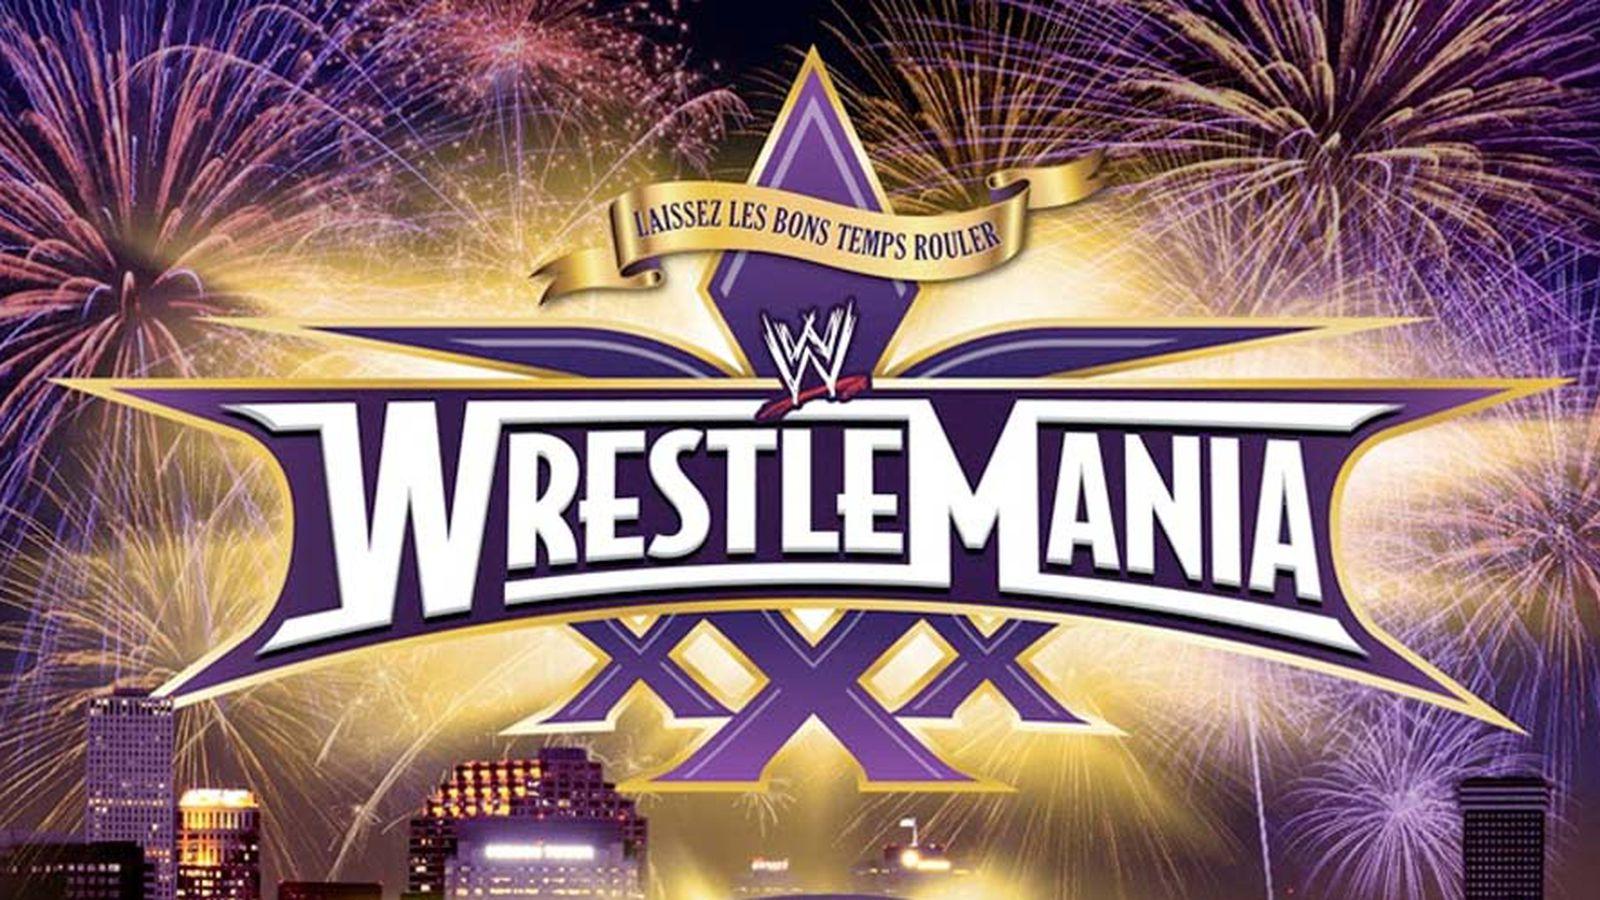 WWE WrestleMania 30 match card previews, predictions, and ...Daniel Bryan Wrestlemania 30 Wallpaper